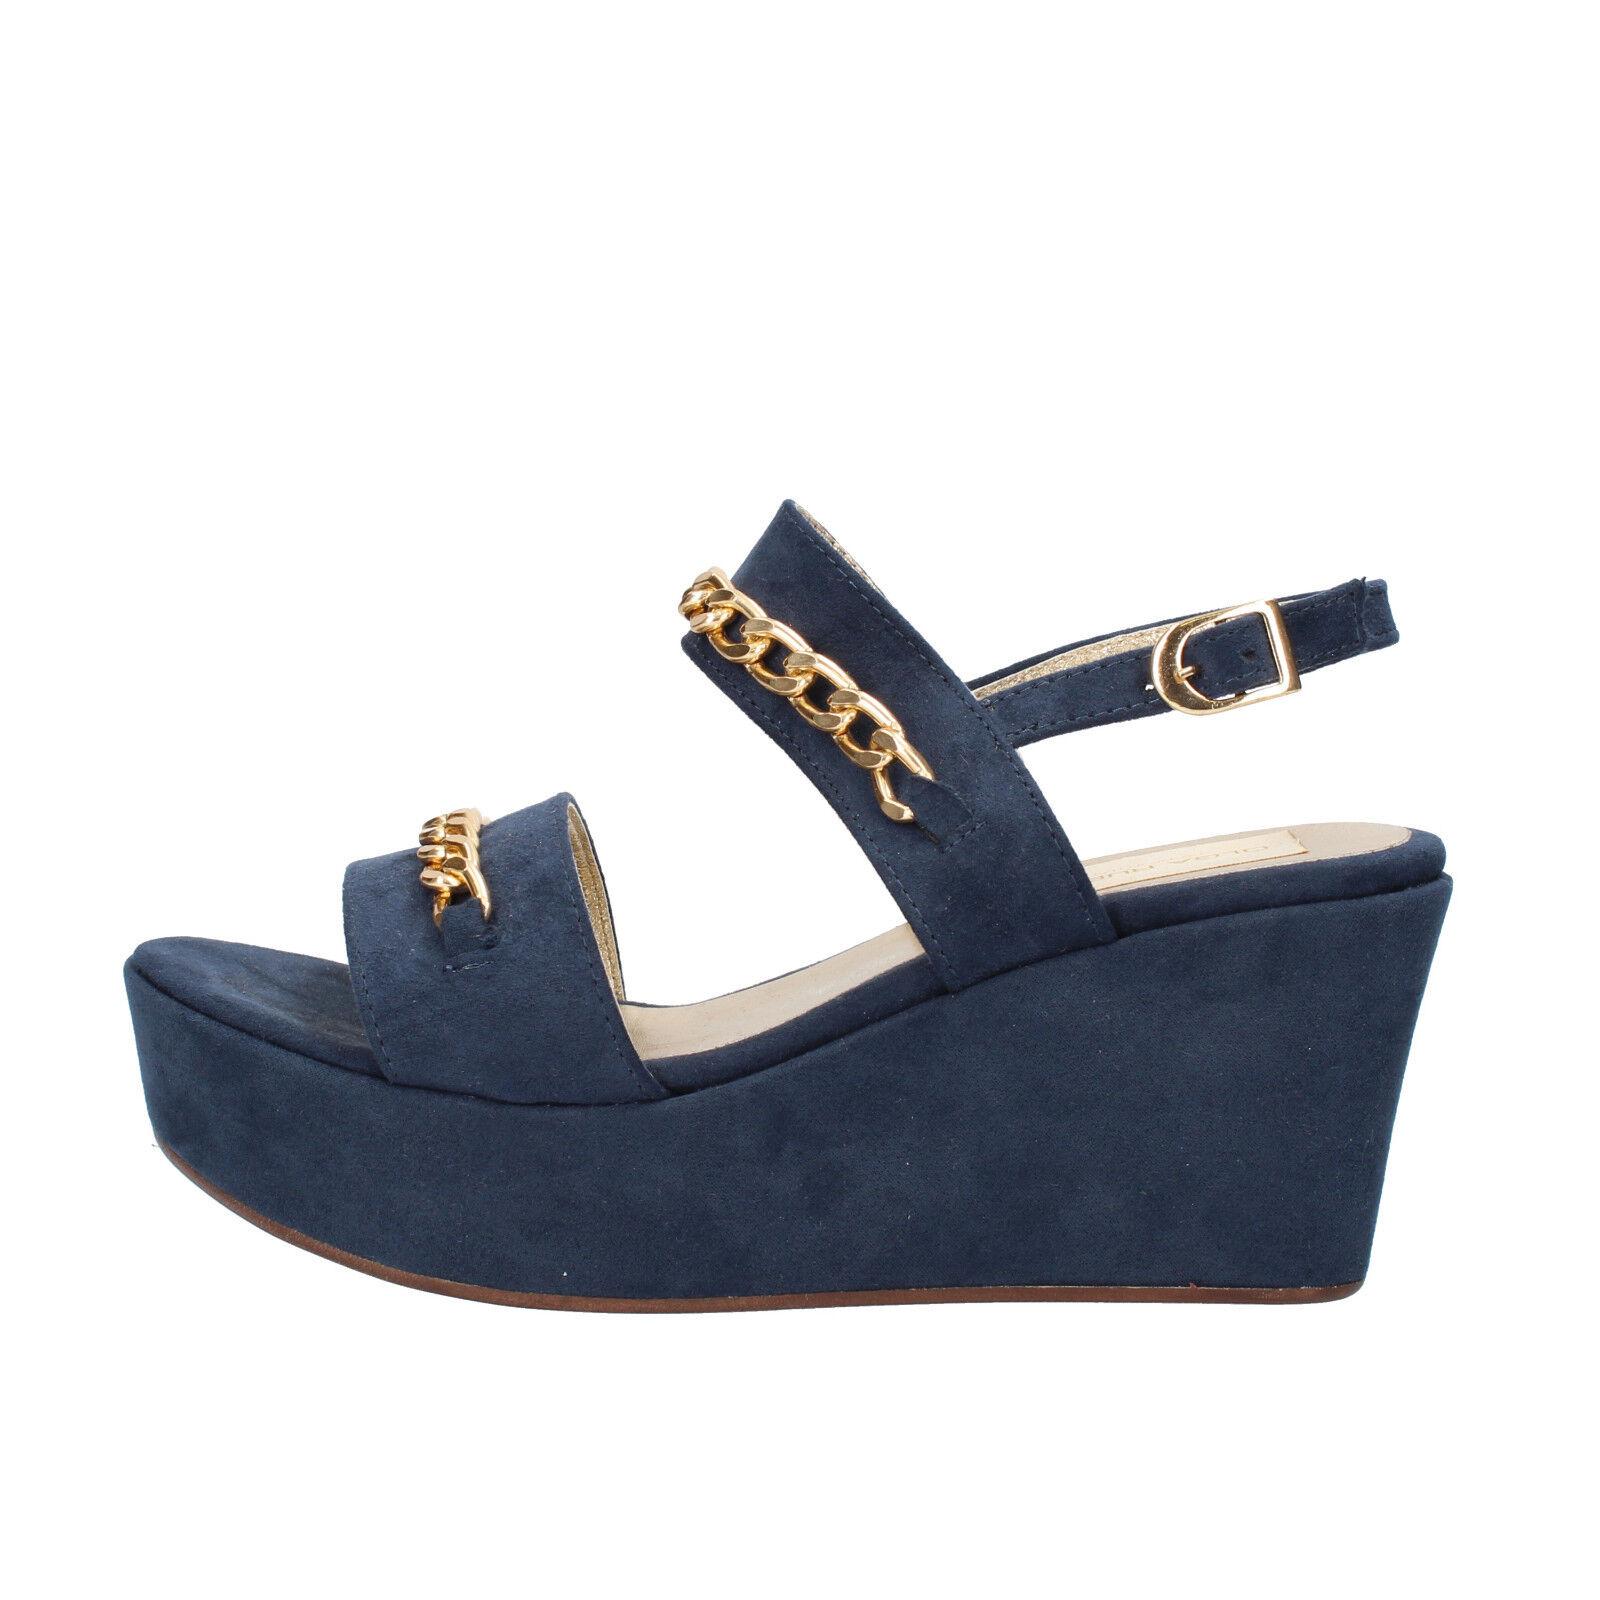 Scarpe donna OLGA RUBINI camoscio camoscio 41 EU sandali blu camoscio RUBINI RUBINI   446890